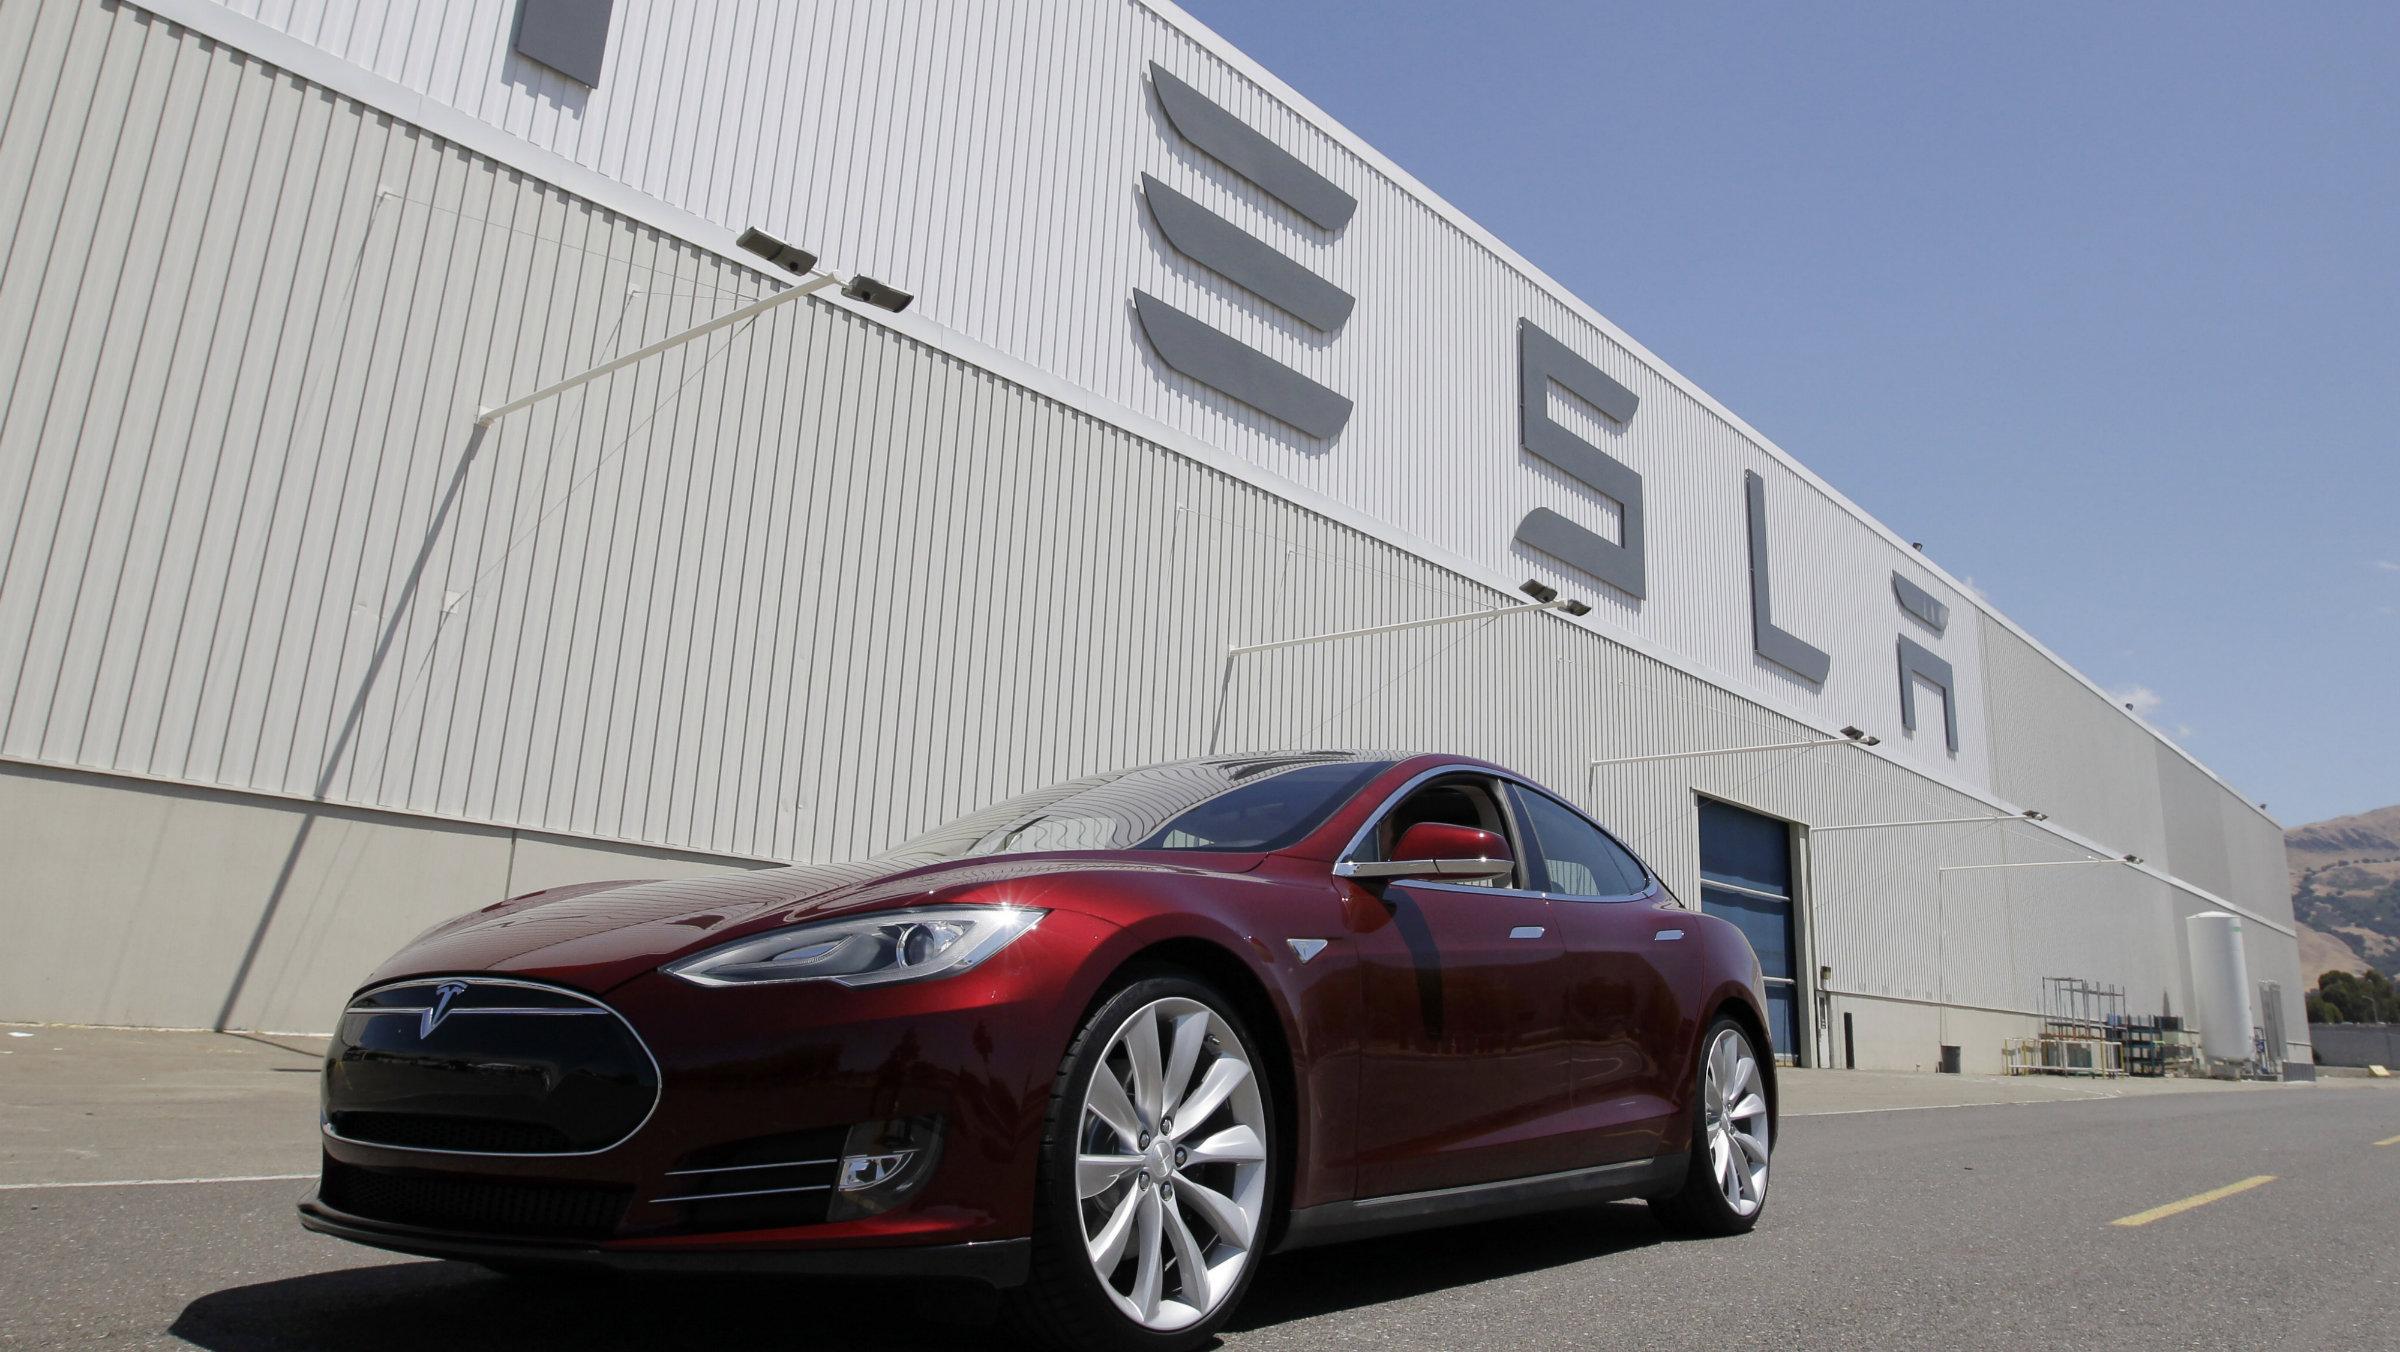 Tesla plant car